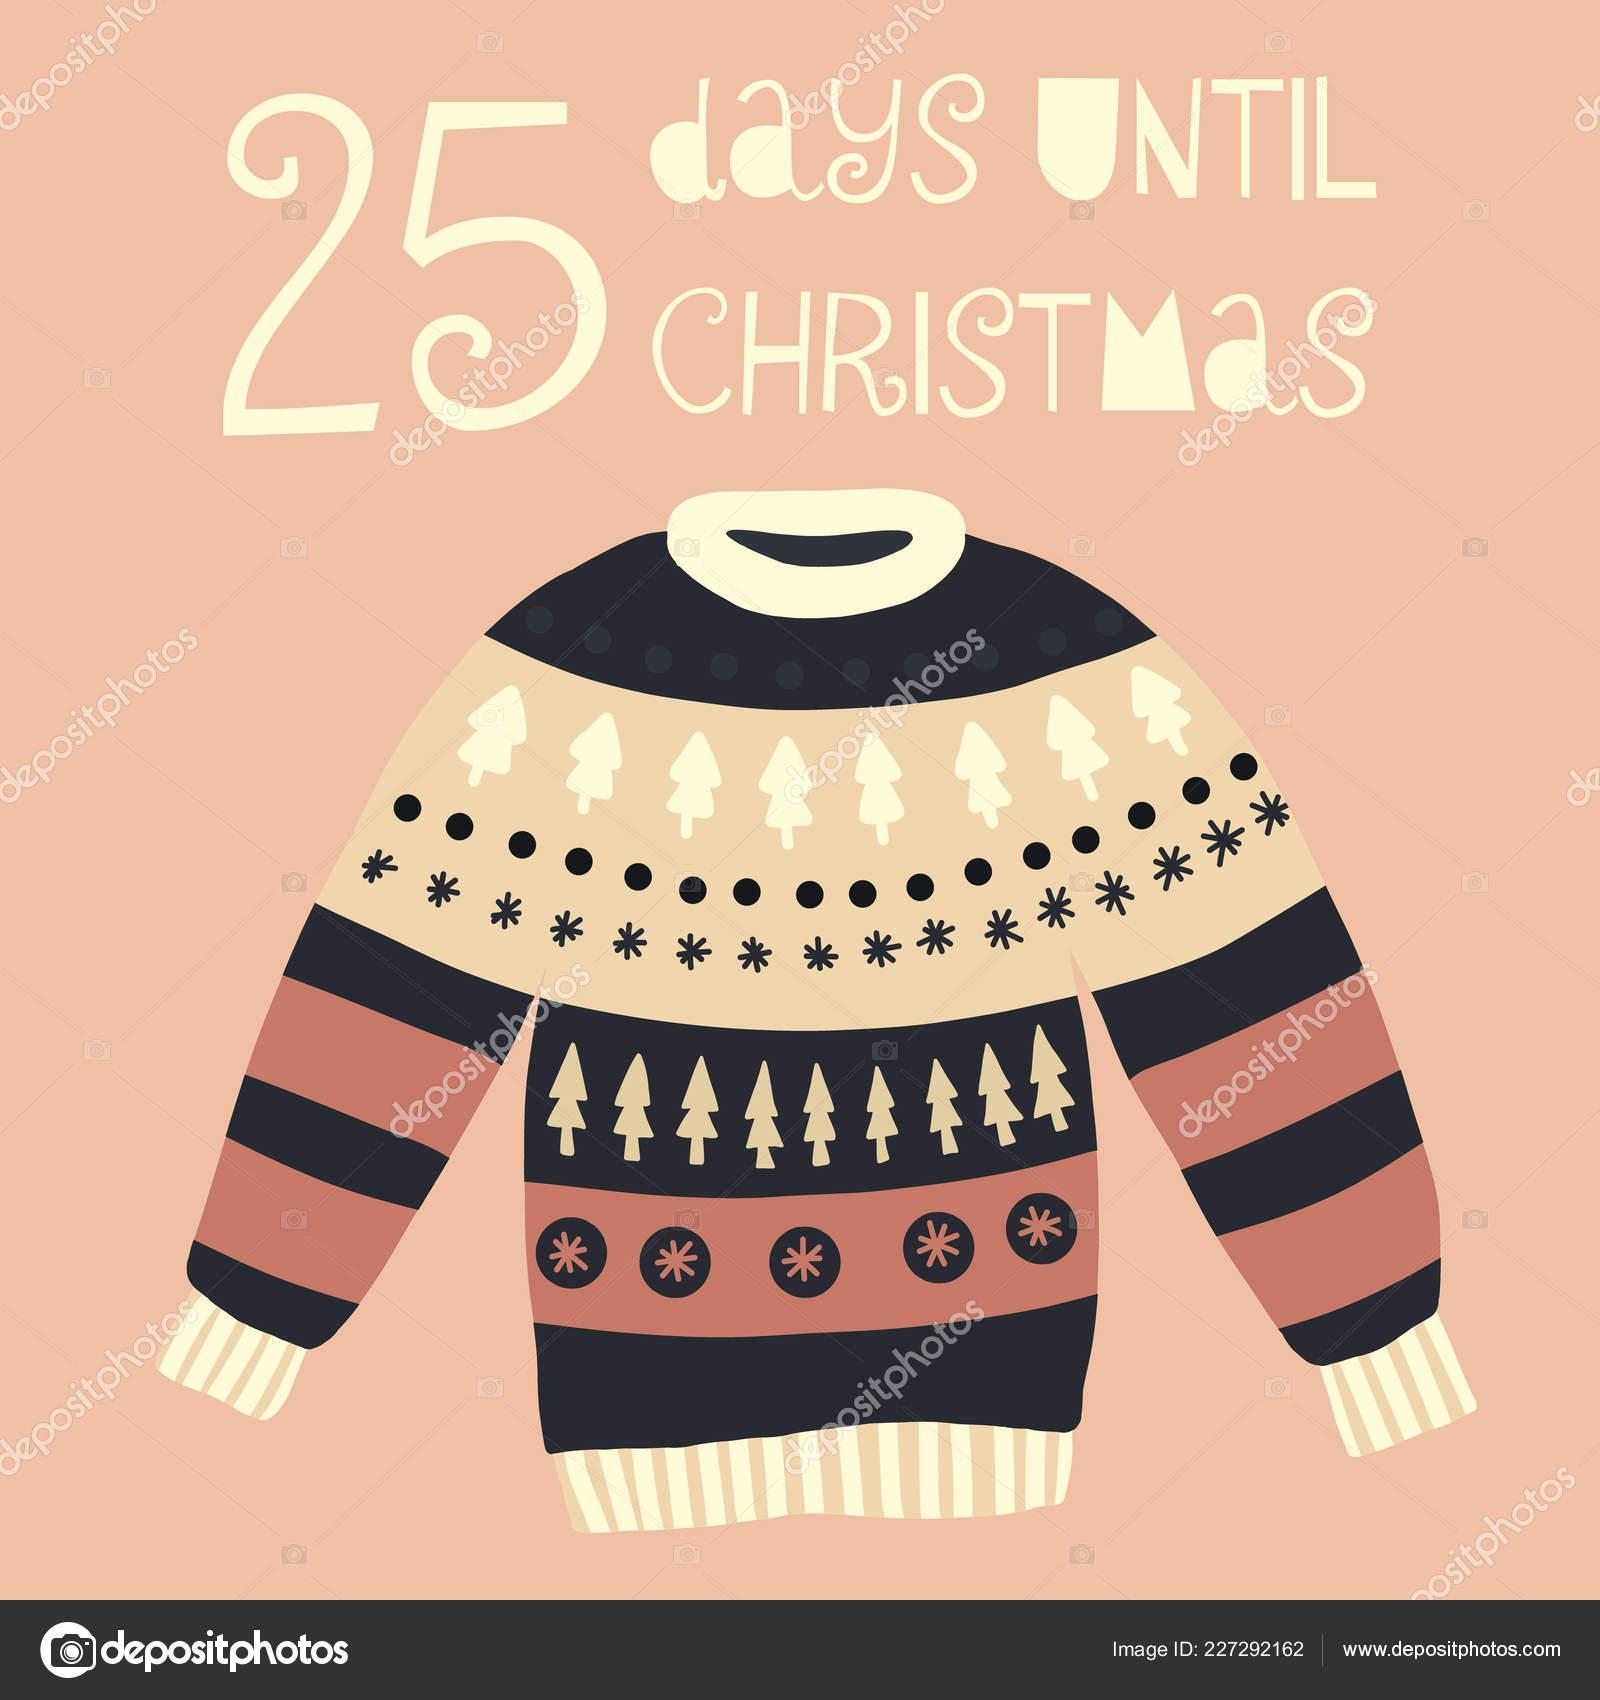 Days Until Christmas Countdown.Days Christmas Vector Illustration Christmas Countdown